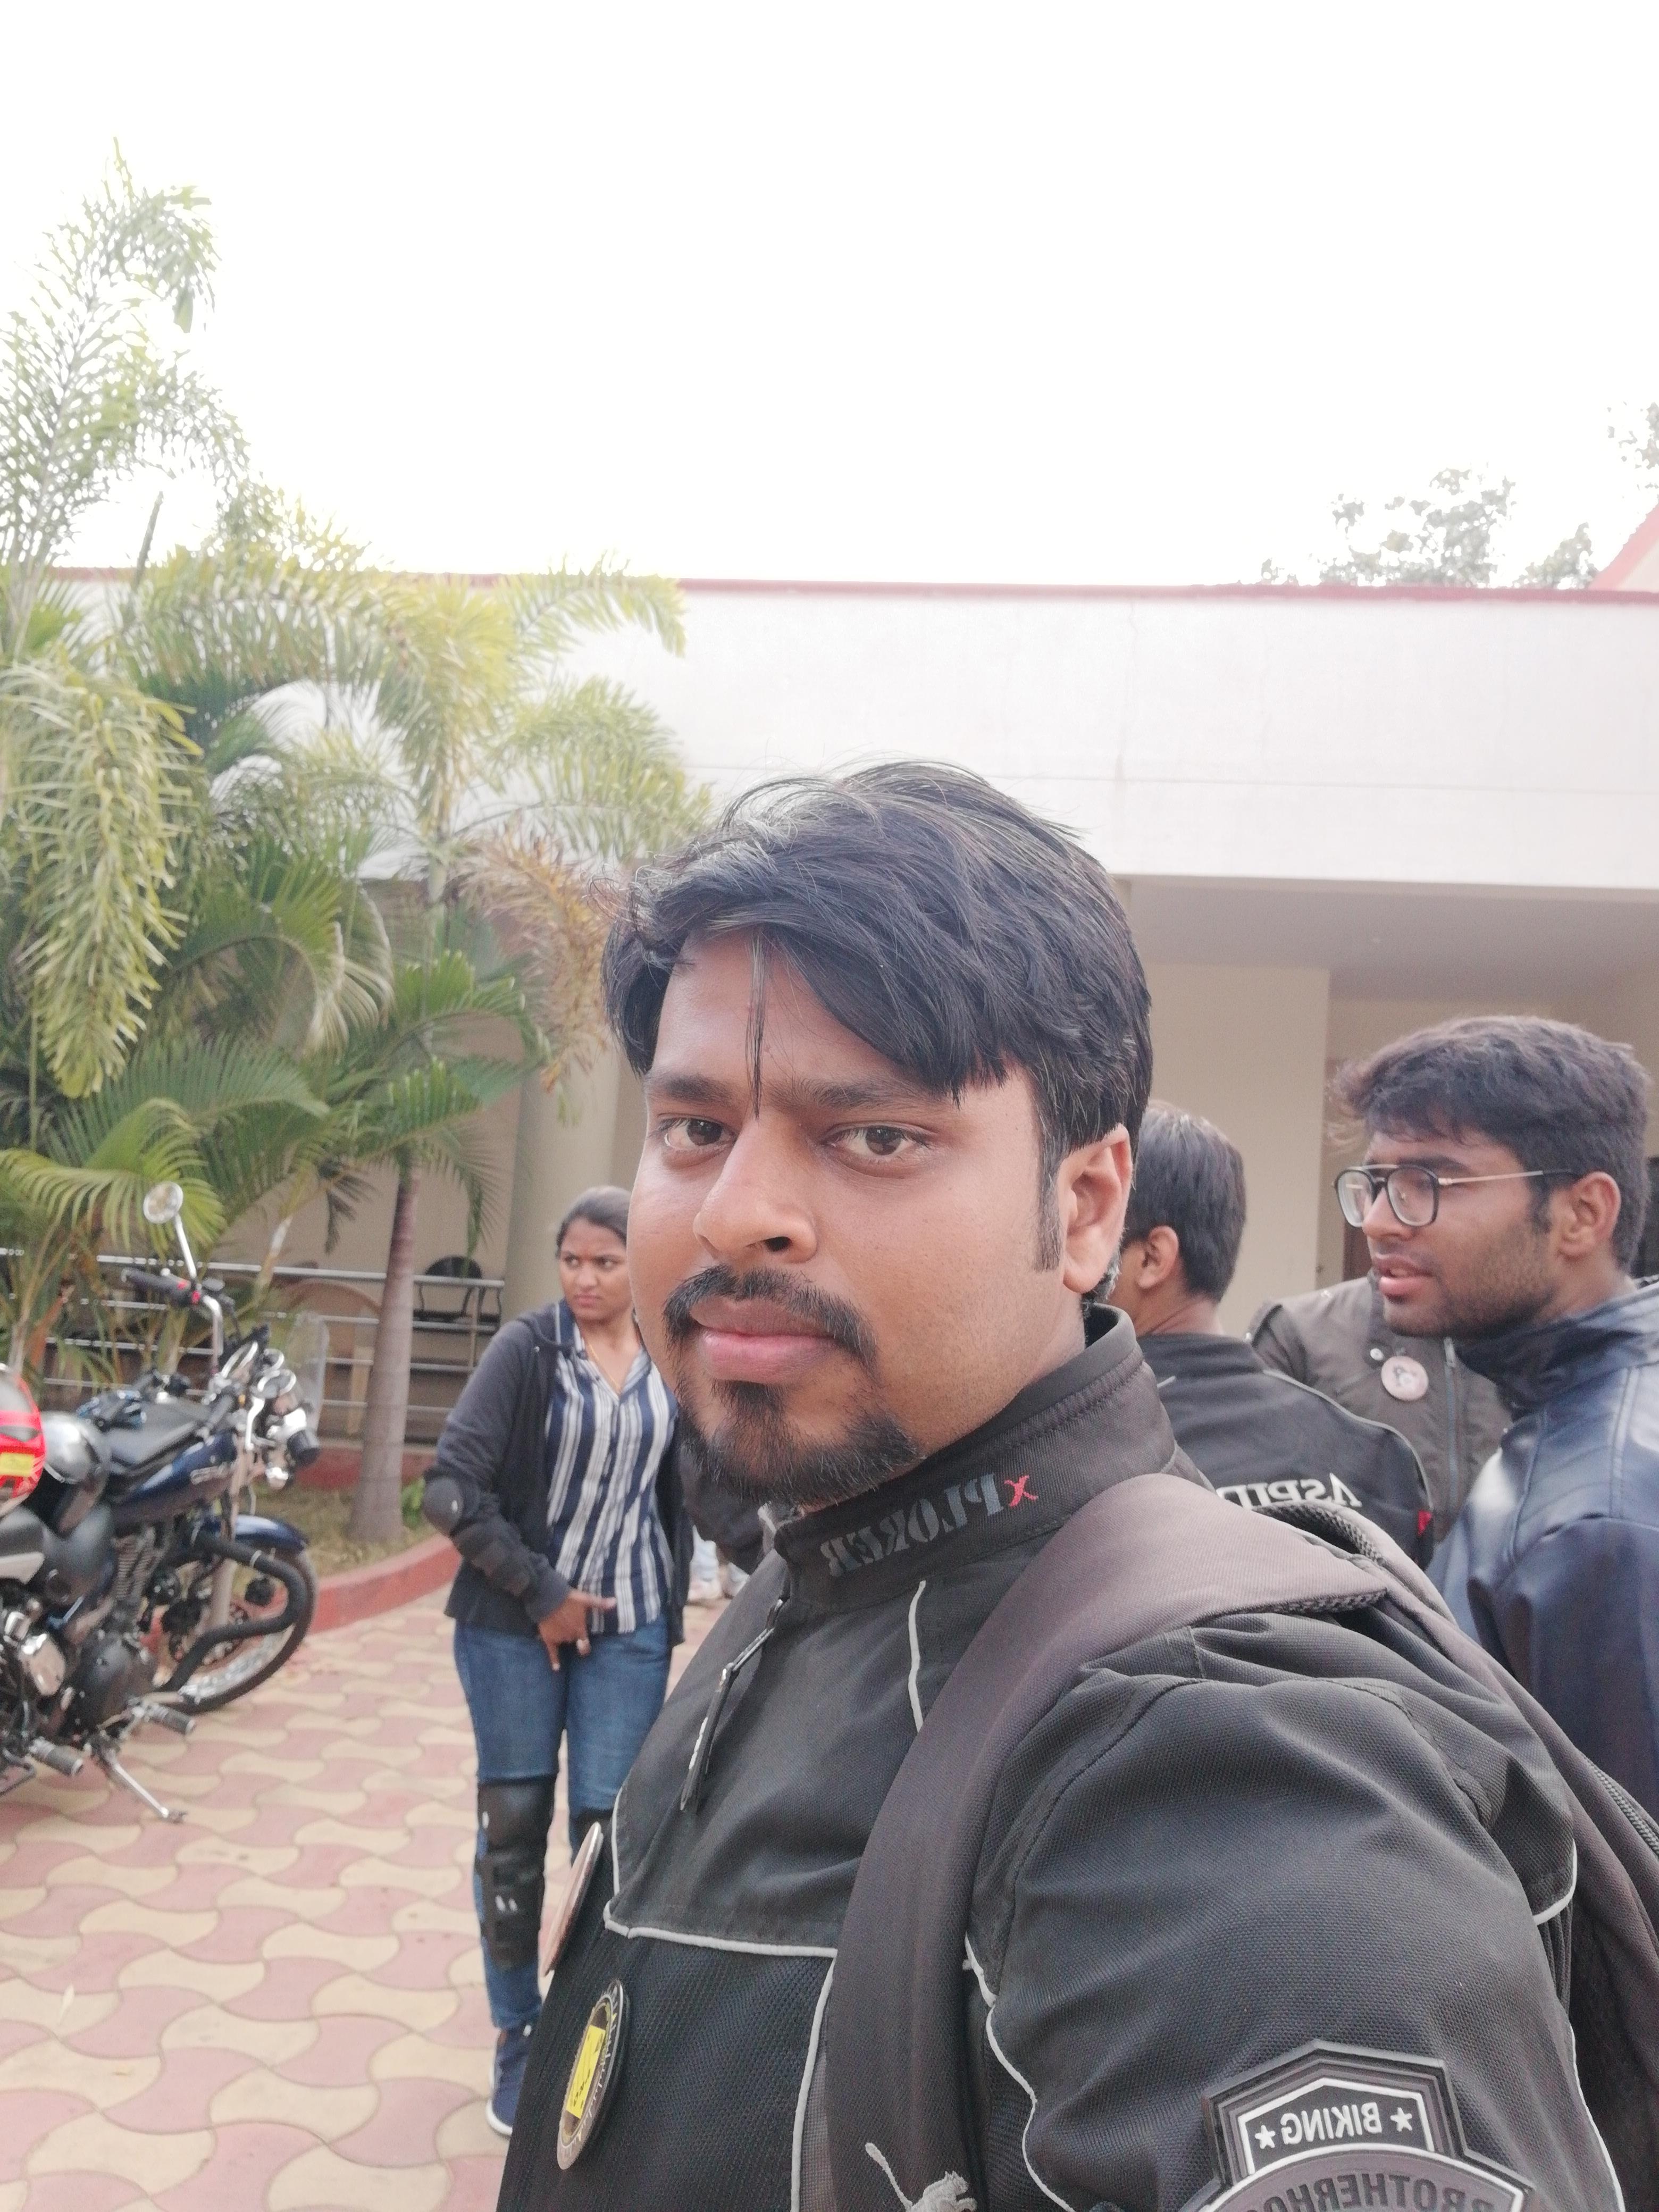 Ride image by Saket Pallava